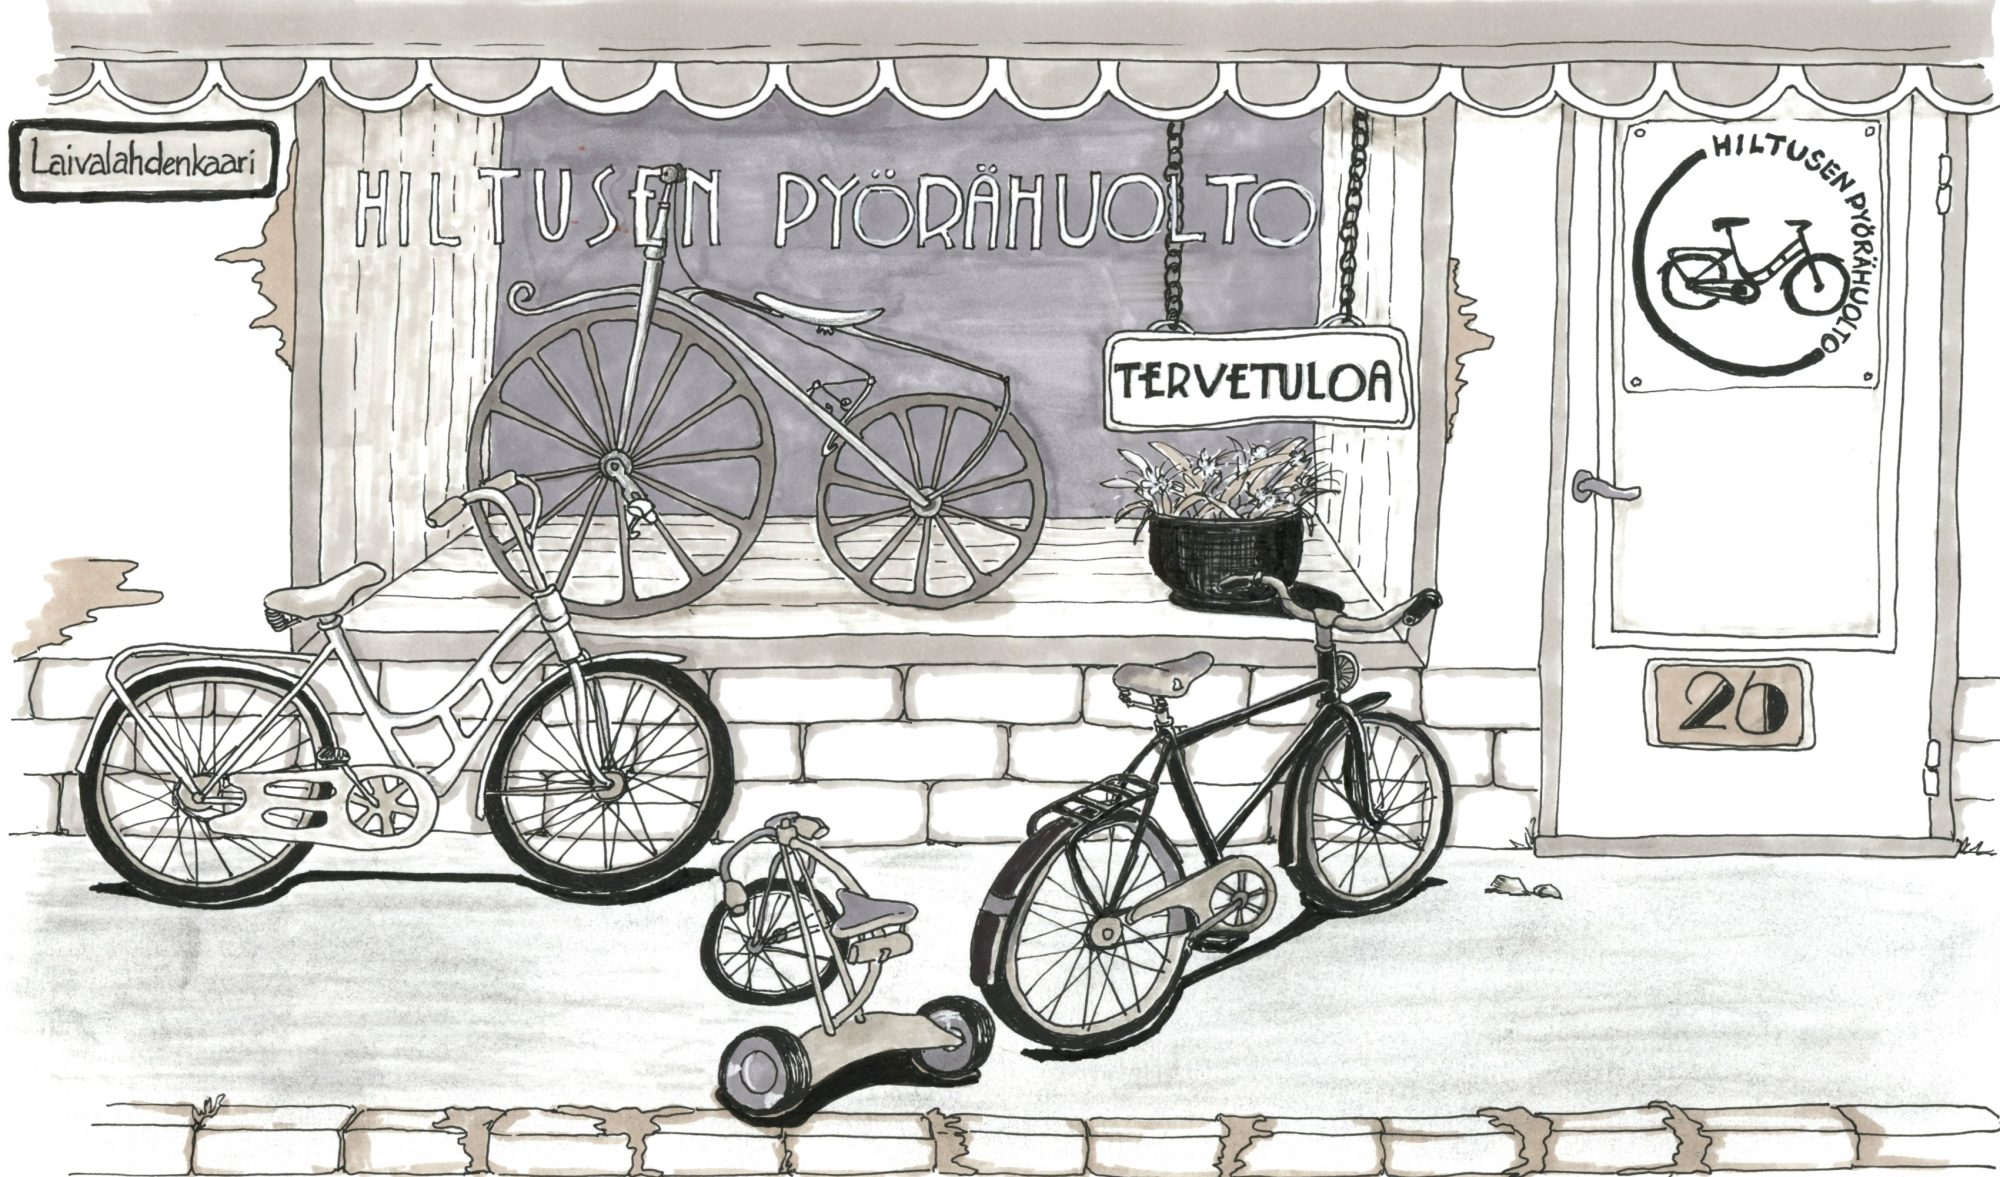 hiltusen pyörähuolto